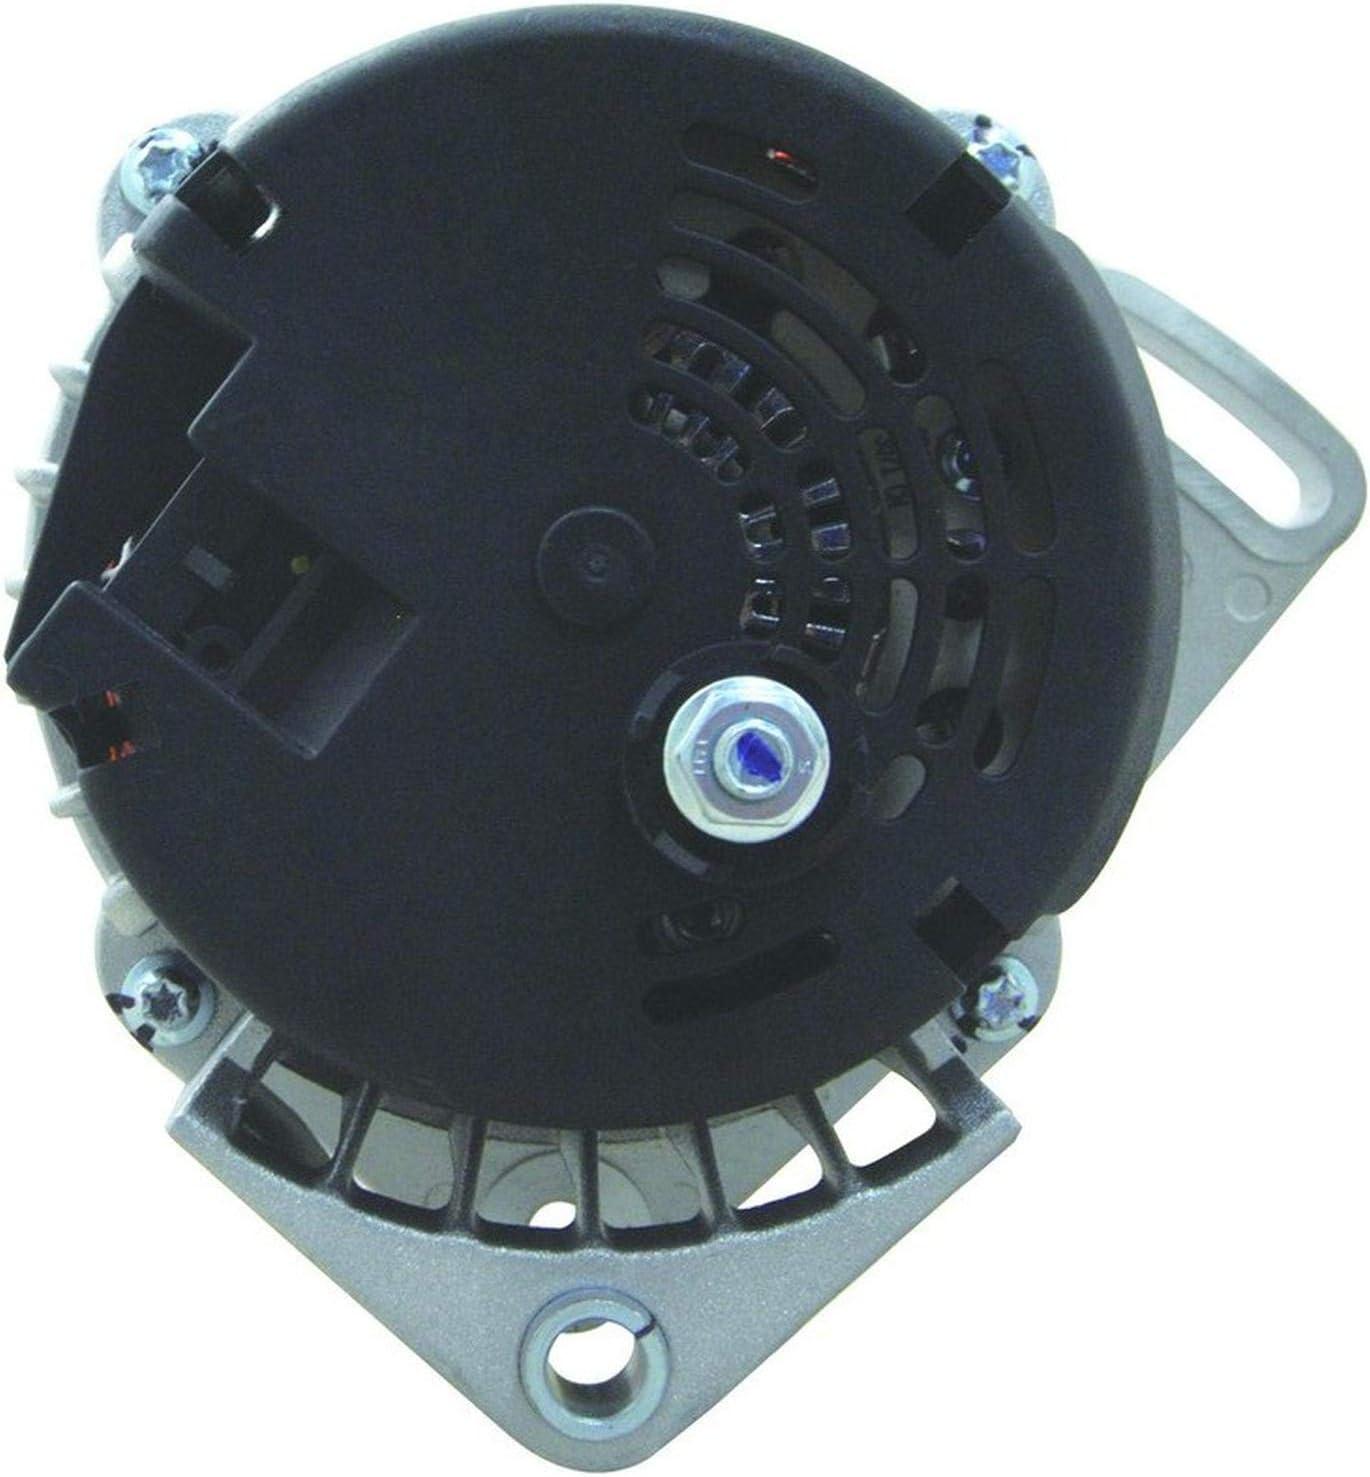 PREMIER GEAR PROFESSIONAL GRADE ENGINEERED FOR QUALITY PGEU-8547 Alternator